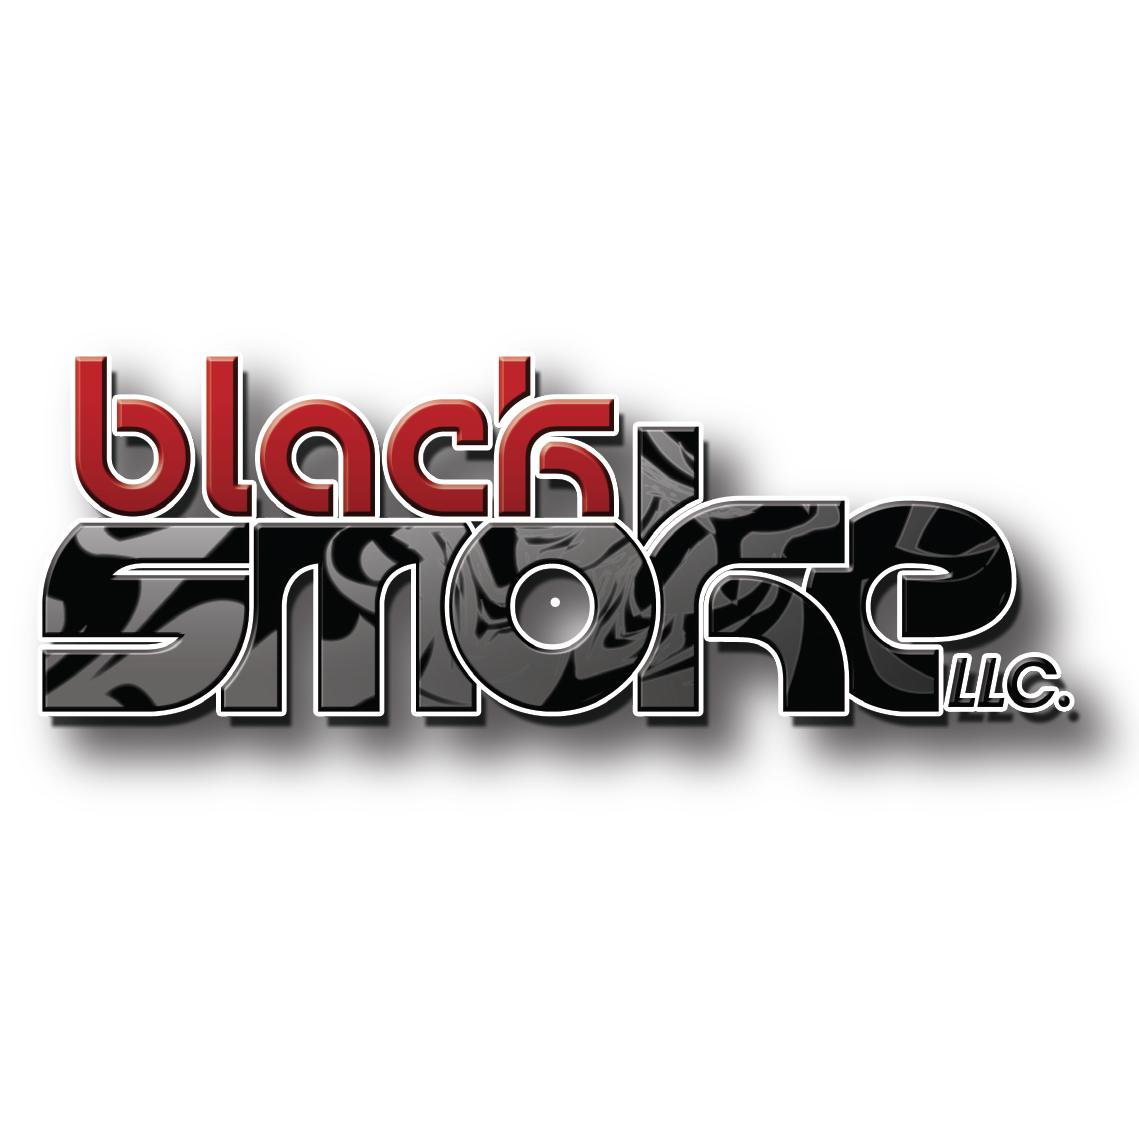 Black Smoke Diesel Performance LLC